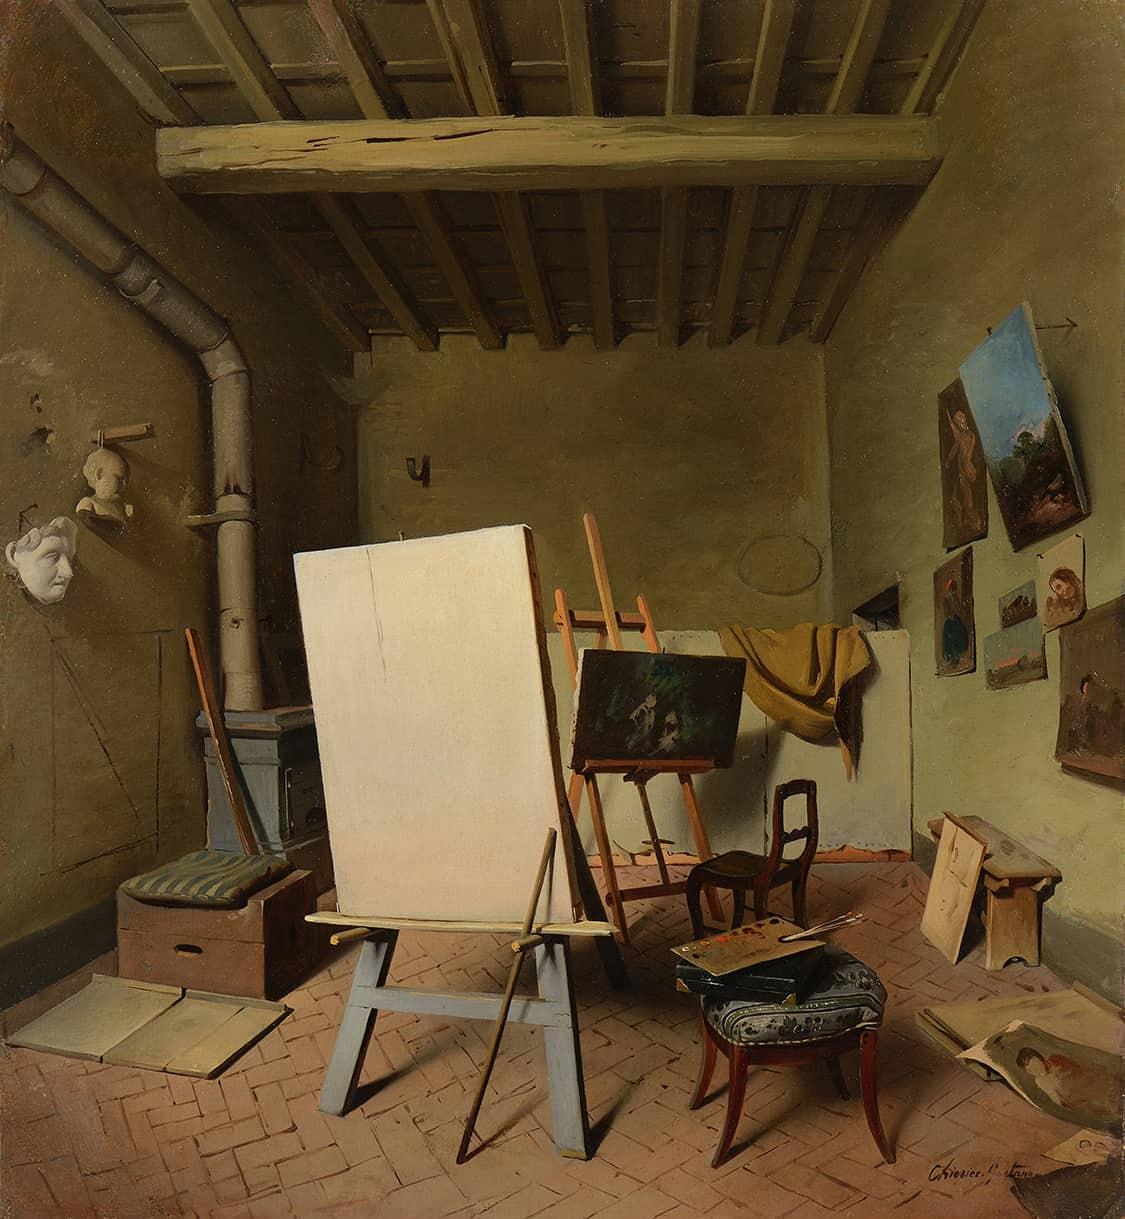 Chierici Gaetano  - The Artist Studio, 1860